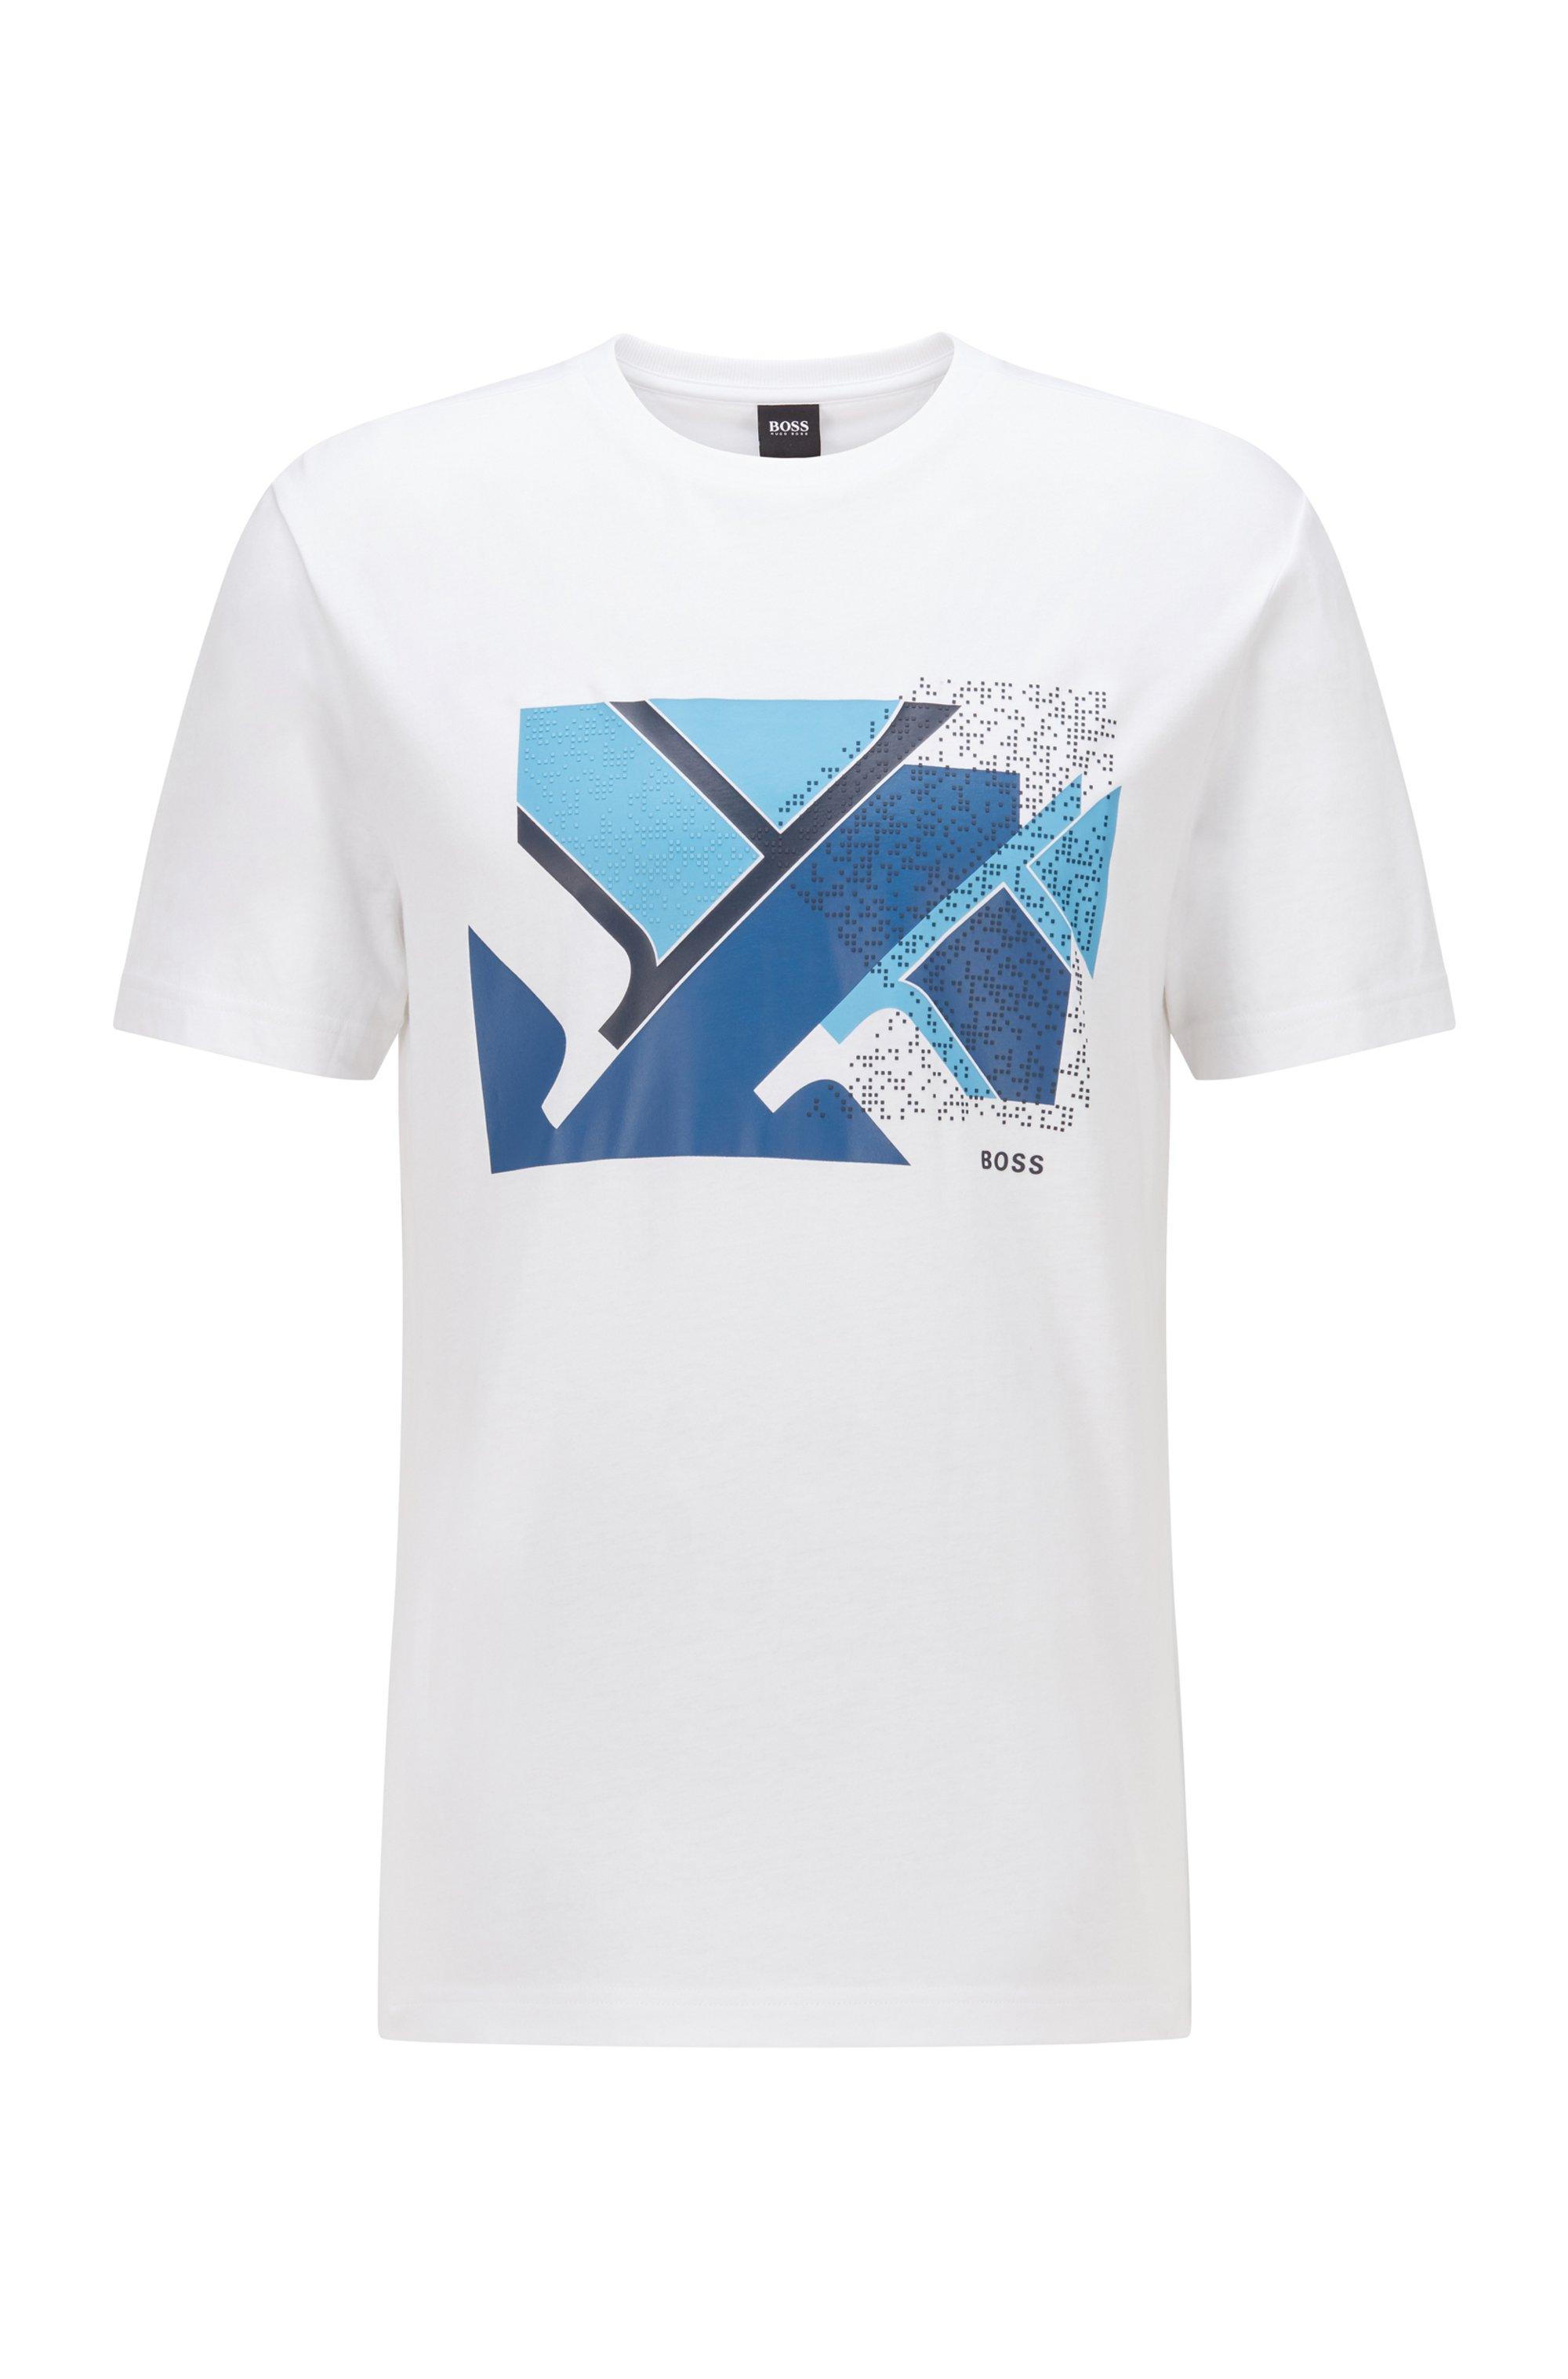 Cotton-blend T-shirt with flag-inspired artwork, White